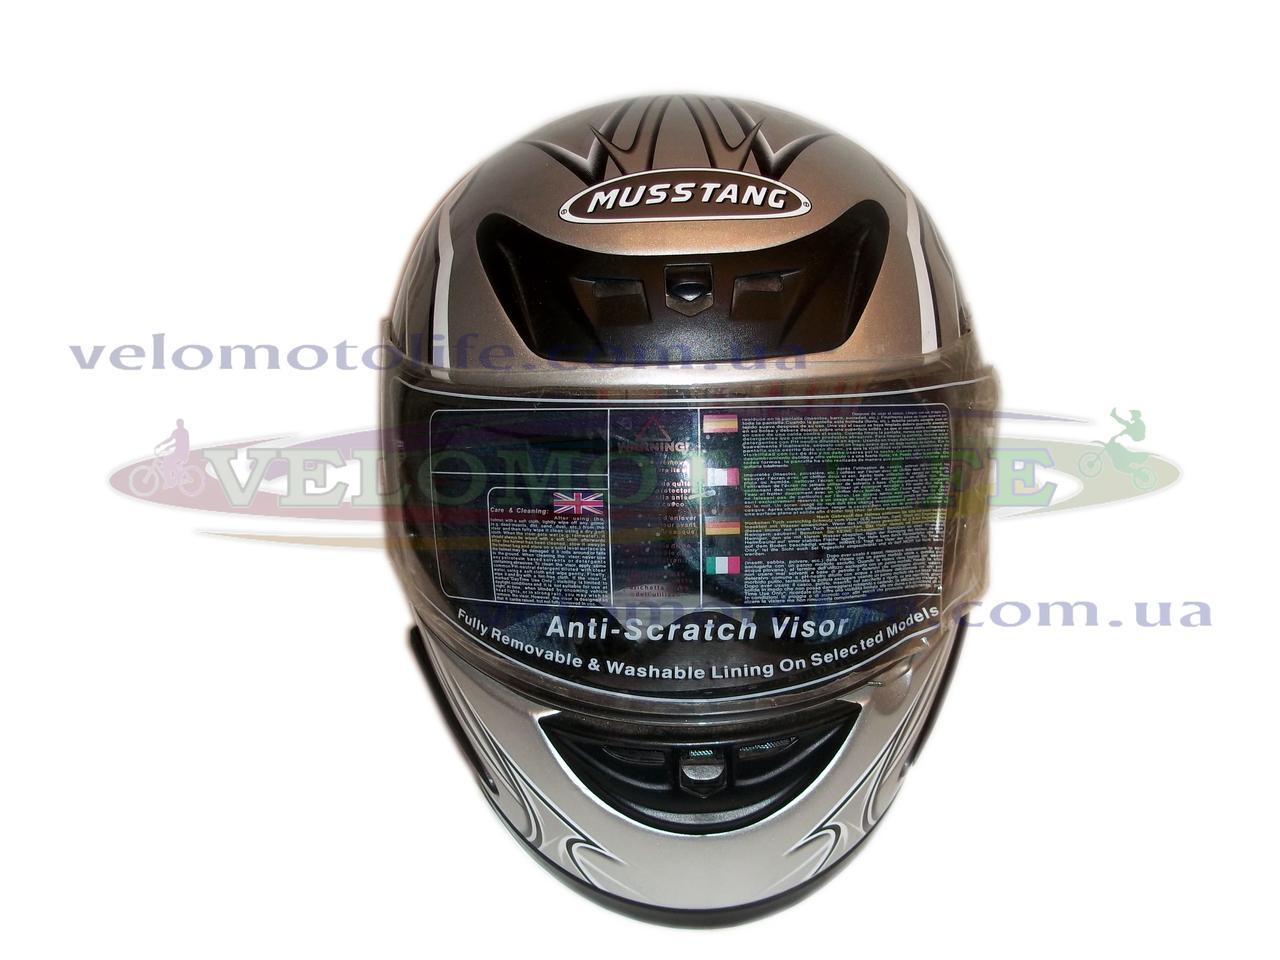 "Шлем зашитный""MUSSTANG"" (размеры S)"